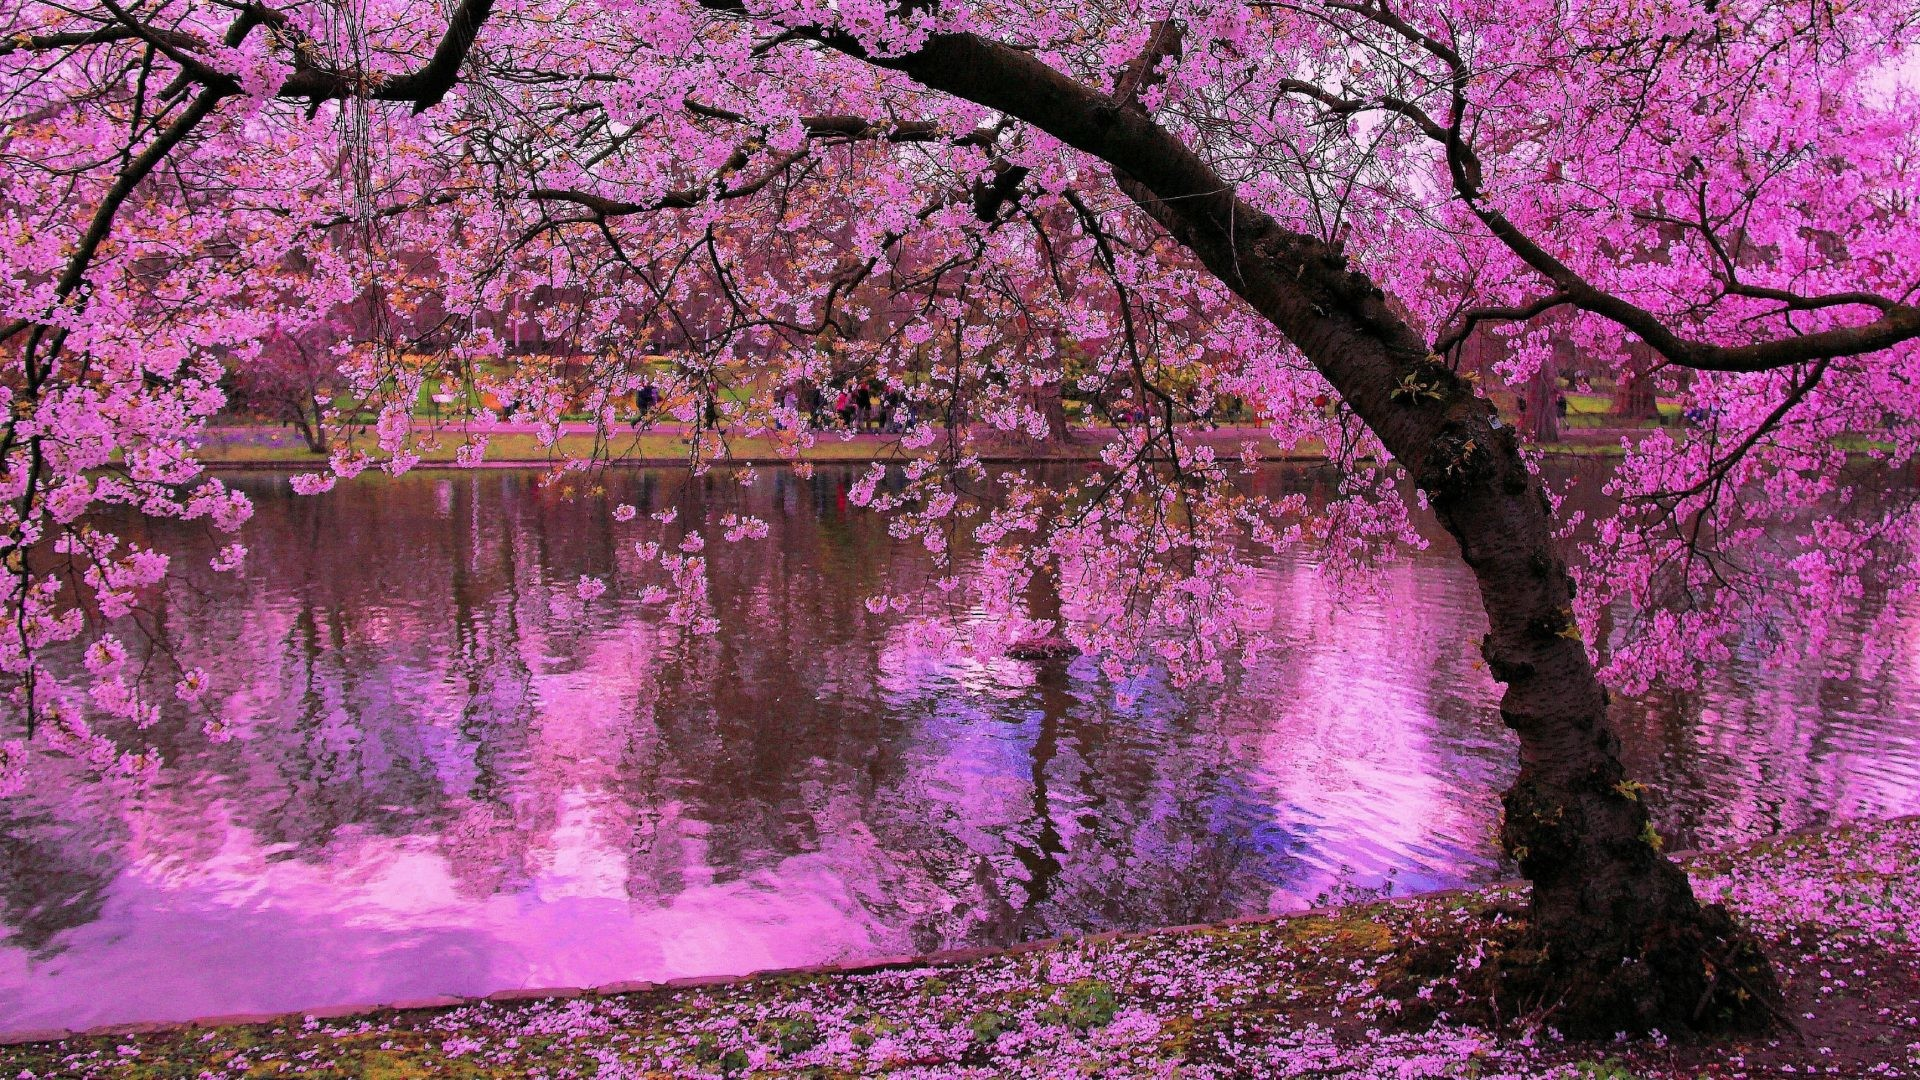 japanese cherry blossom wallpaper 1920x1080 59 images. Black Bedroom Furniture Sets. Home Design Ideas